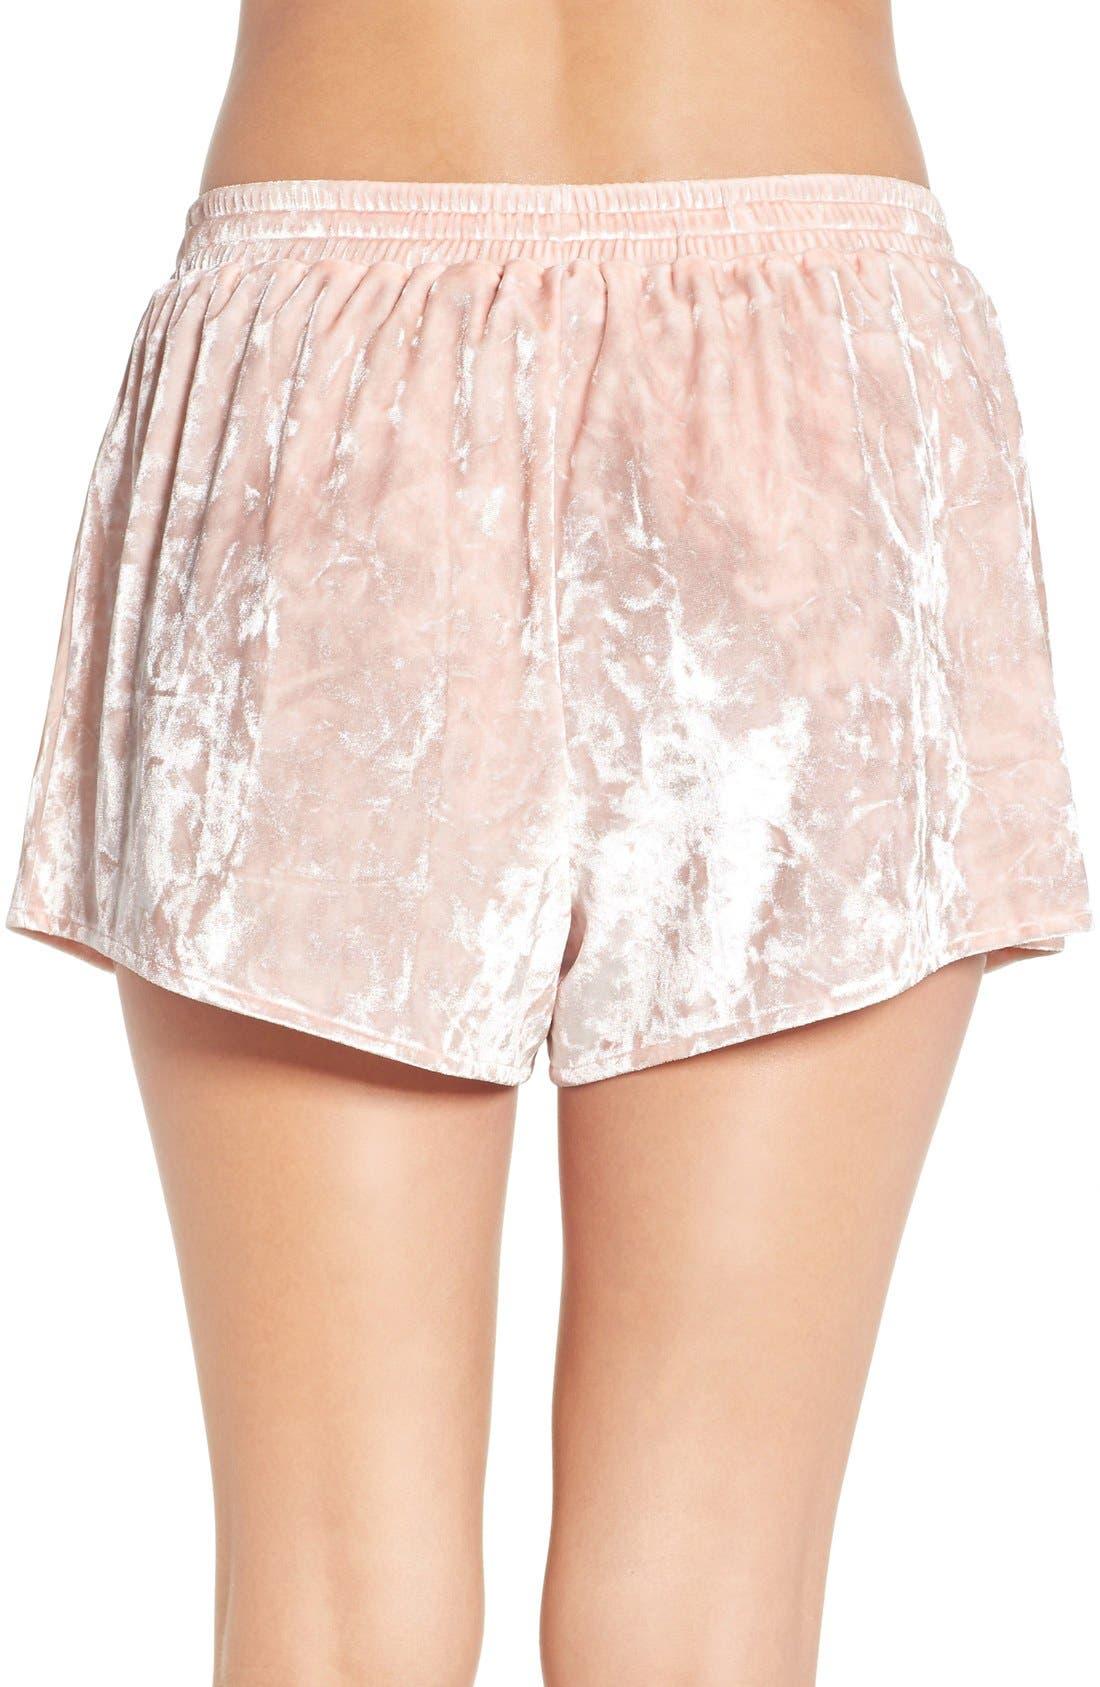 Crushed Velvet Shorts,                             Alternate thumbnail 2, color,                             Pink Wood